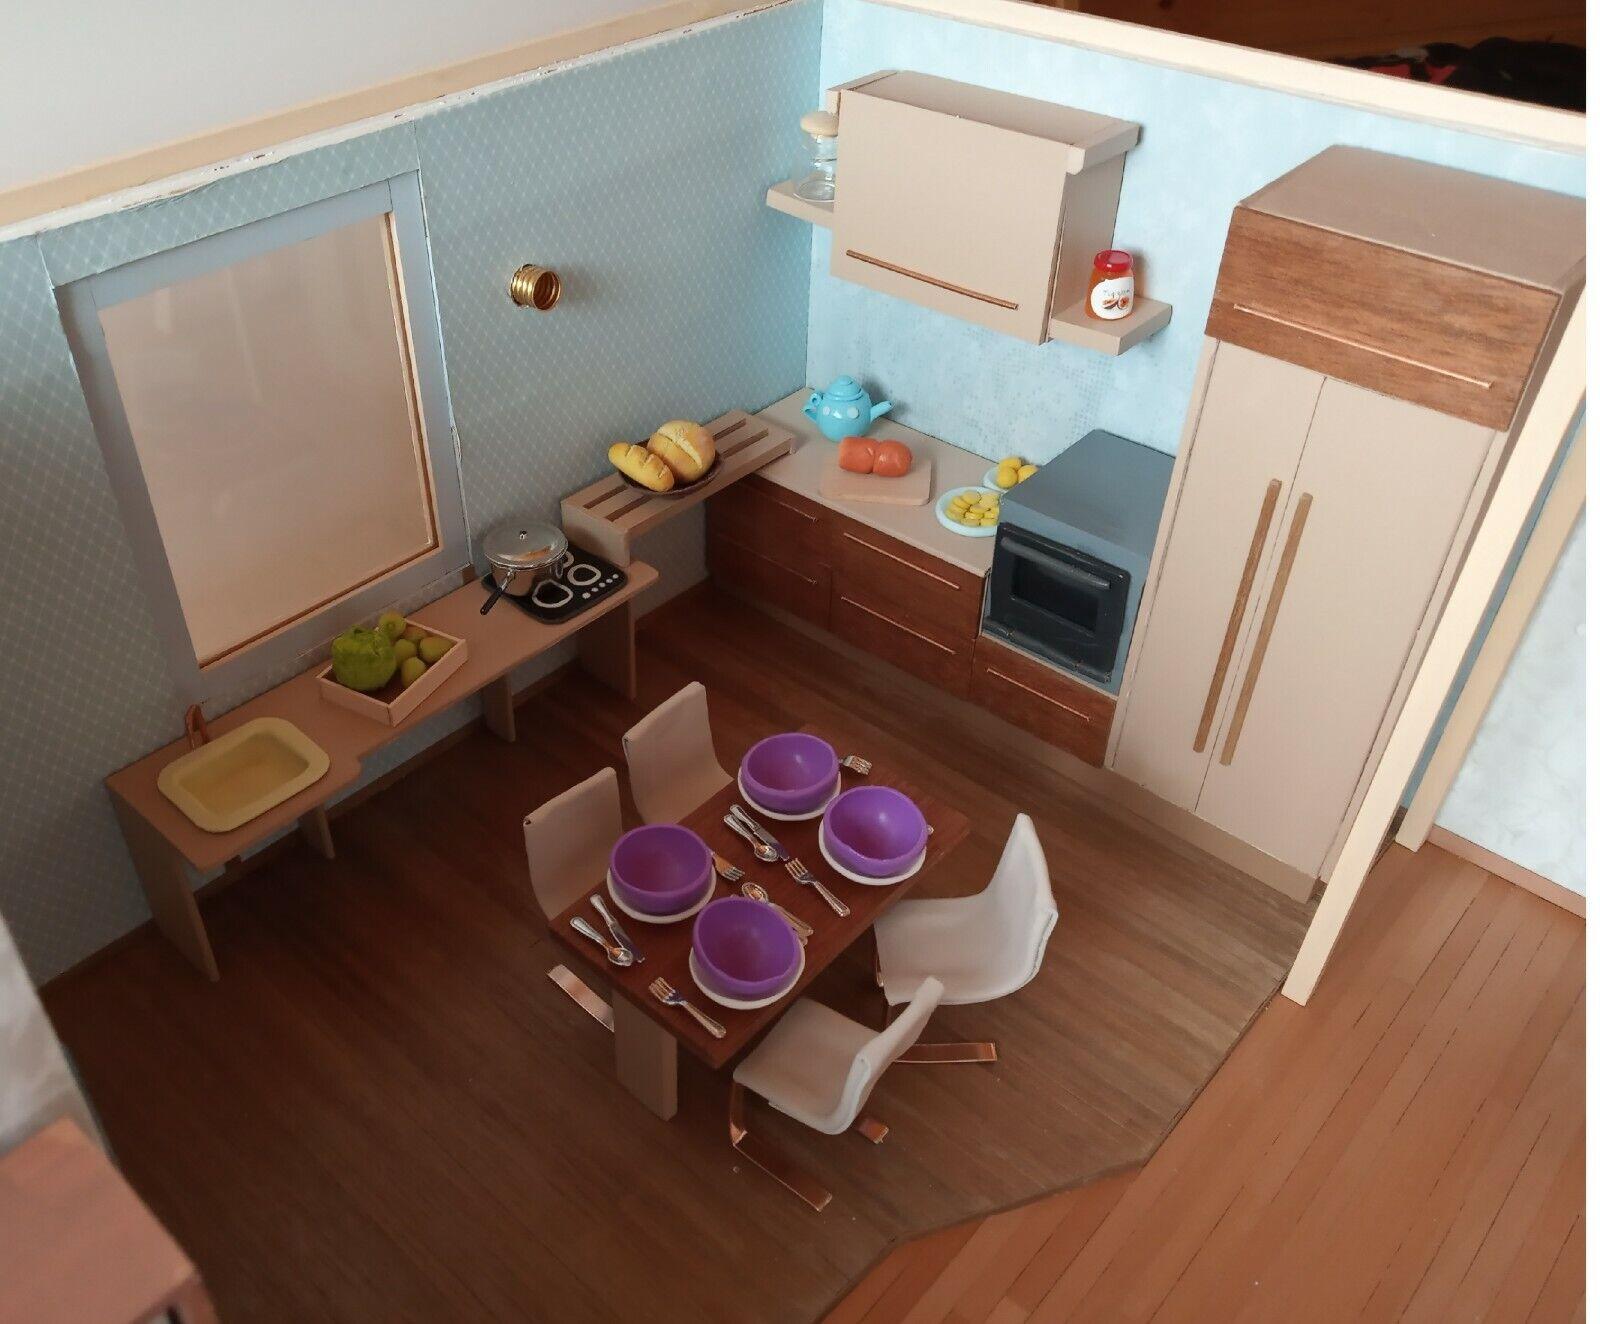 A miniature miniature miniature kitchen set with accessories bc8d93